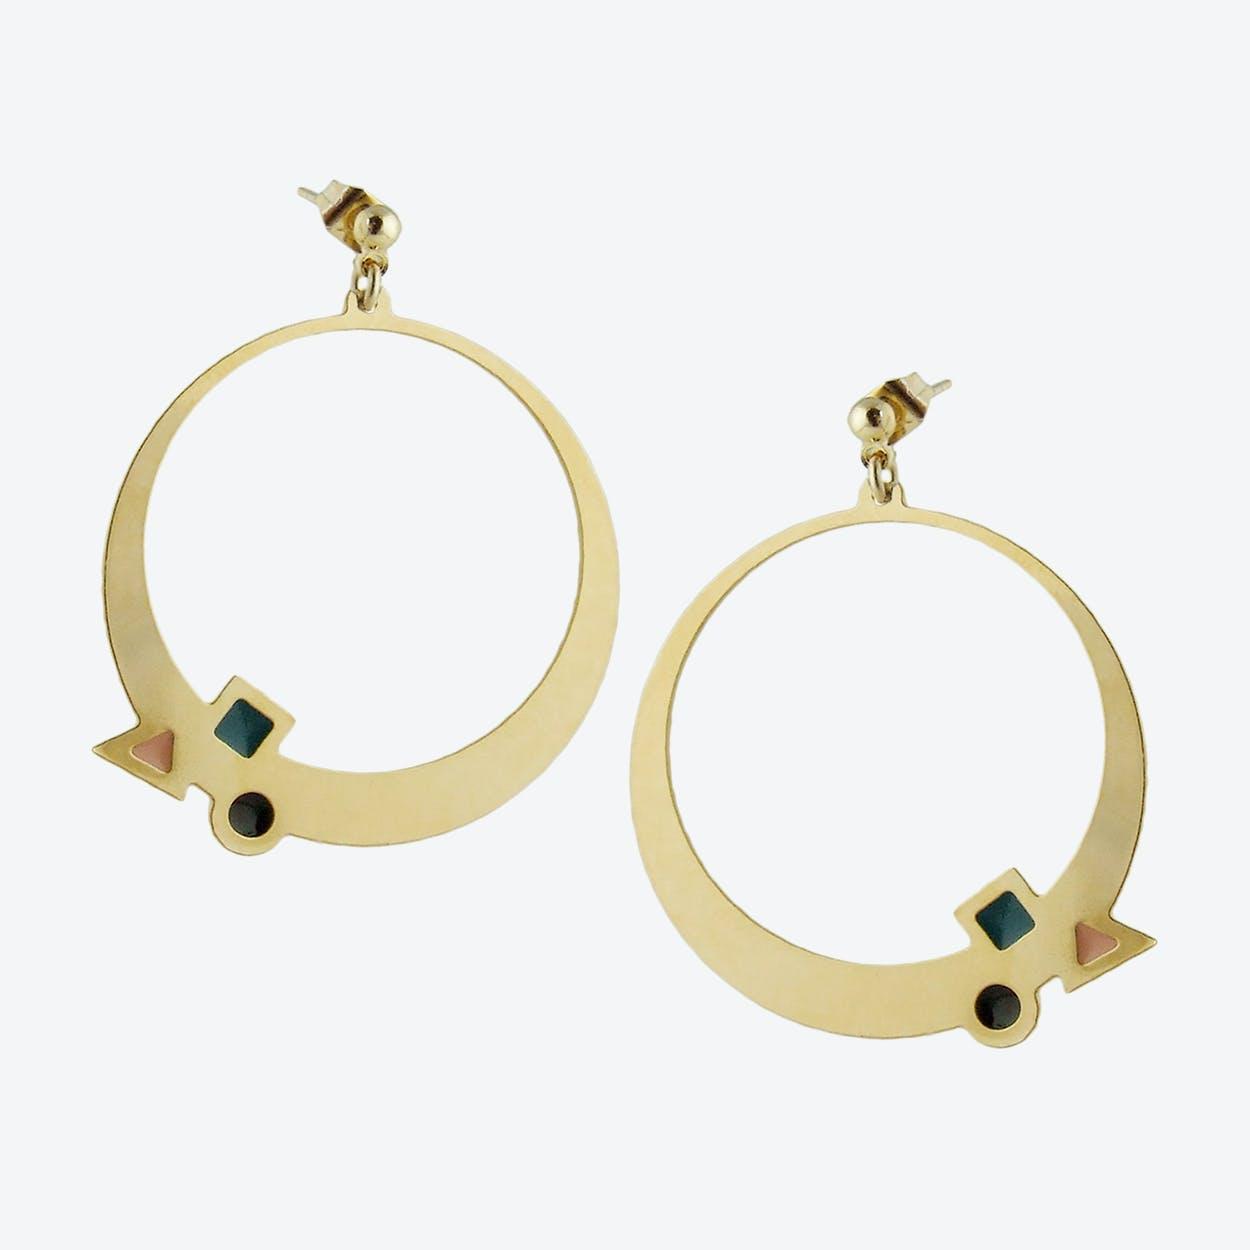 Geometric Gold Hoop Earrings in Emerald, Black, and Blush